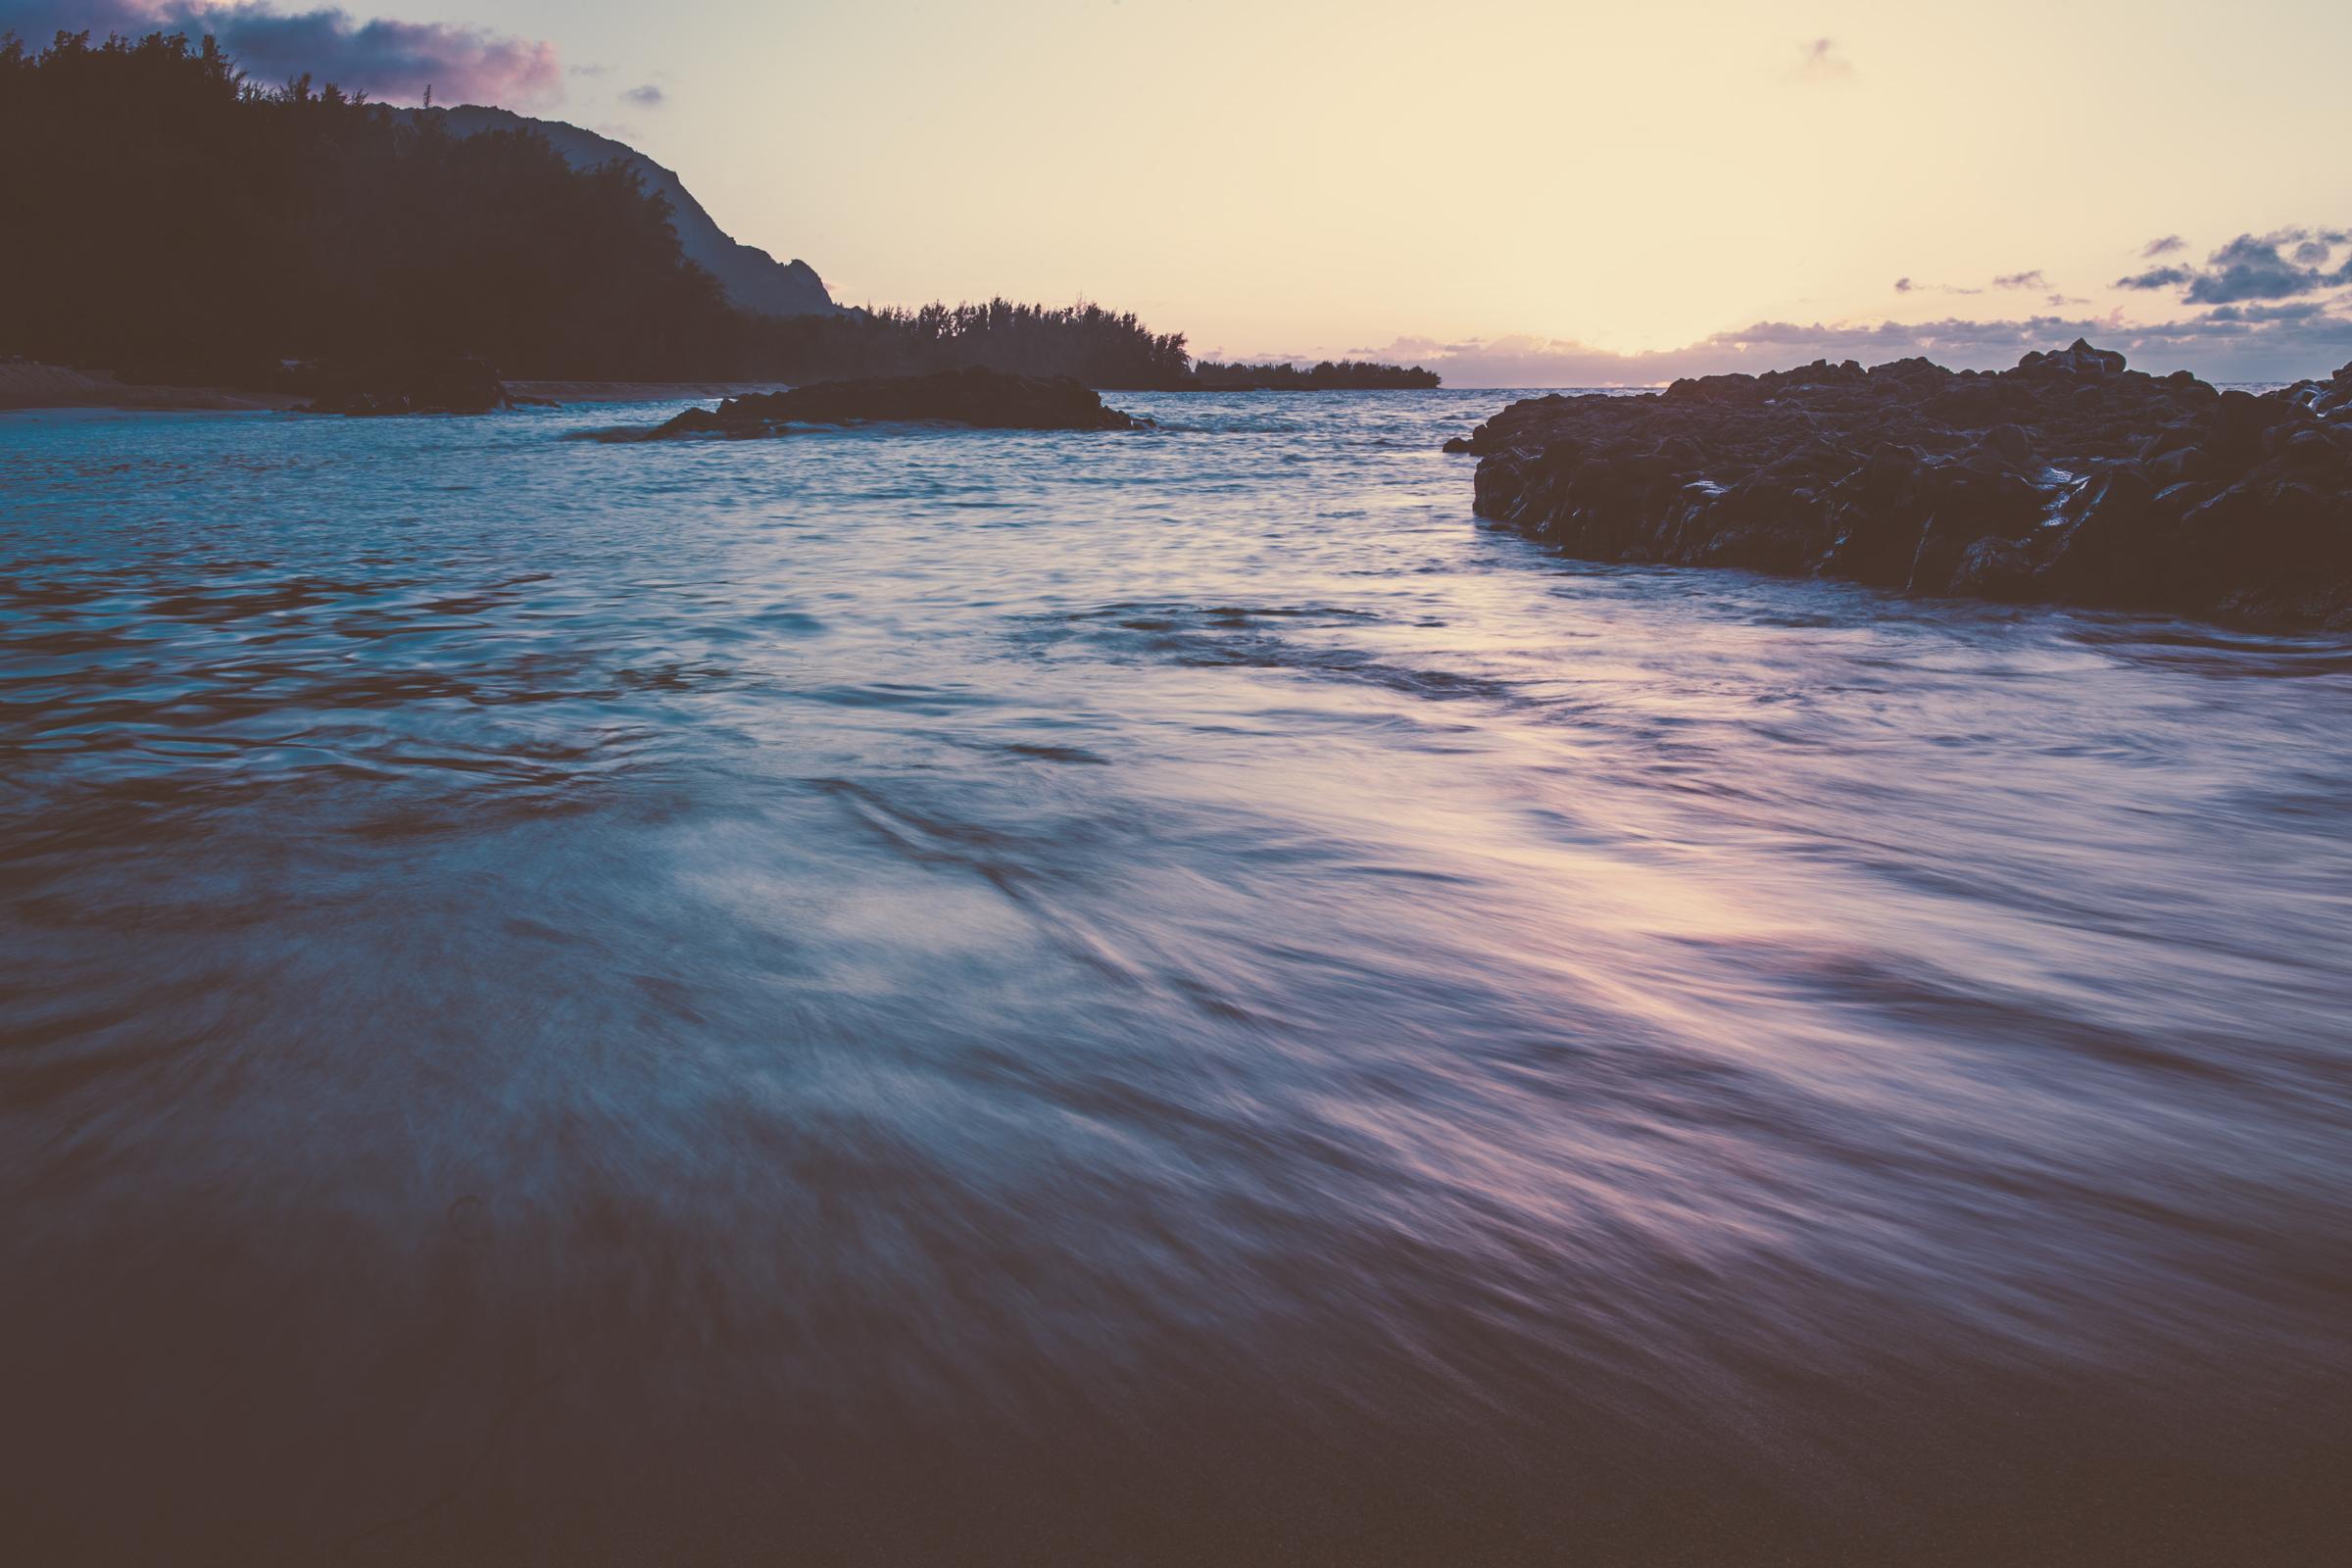 IMG_2927--KAUAI-HAWAII-JENNIFER-PICARD-PHOTOGRAPHY.jpg